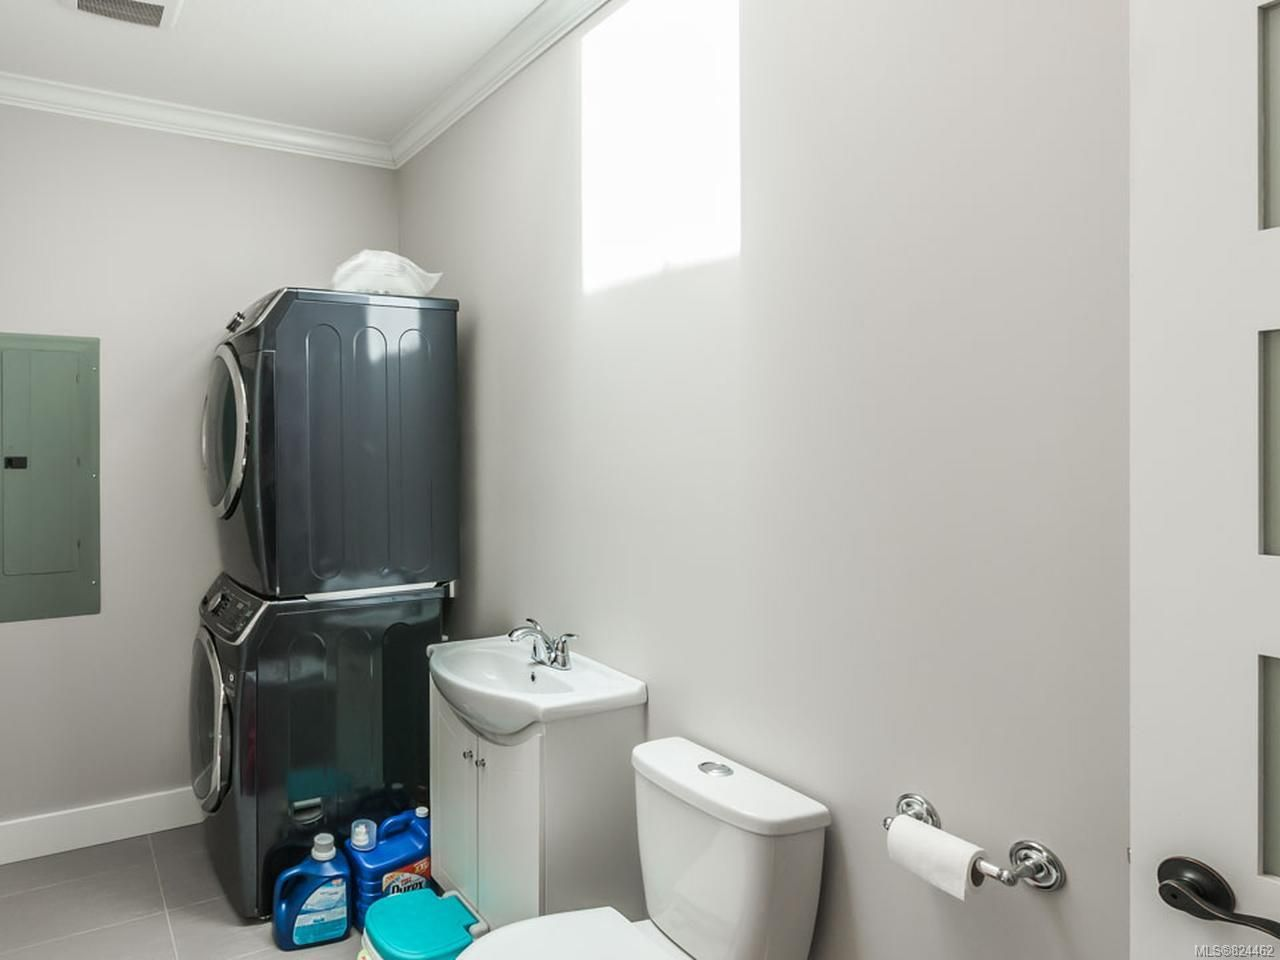 Photo 15: Photos: 3864 Gulfview Dr in NANAIMO: Na North Nanaimo House for sale (Nanaimo)  : MLS®# 824462